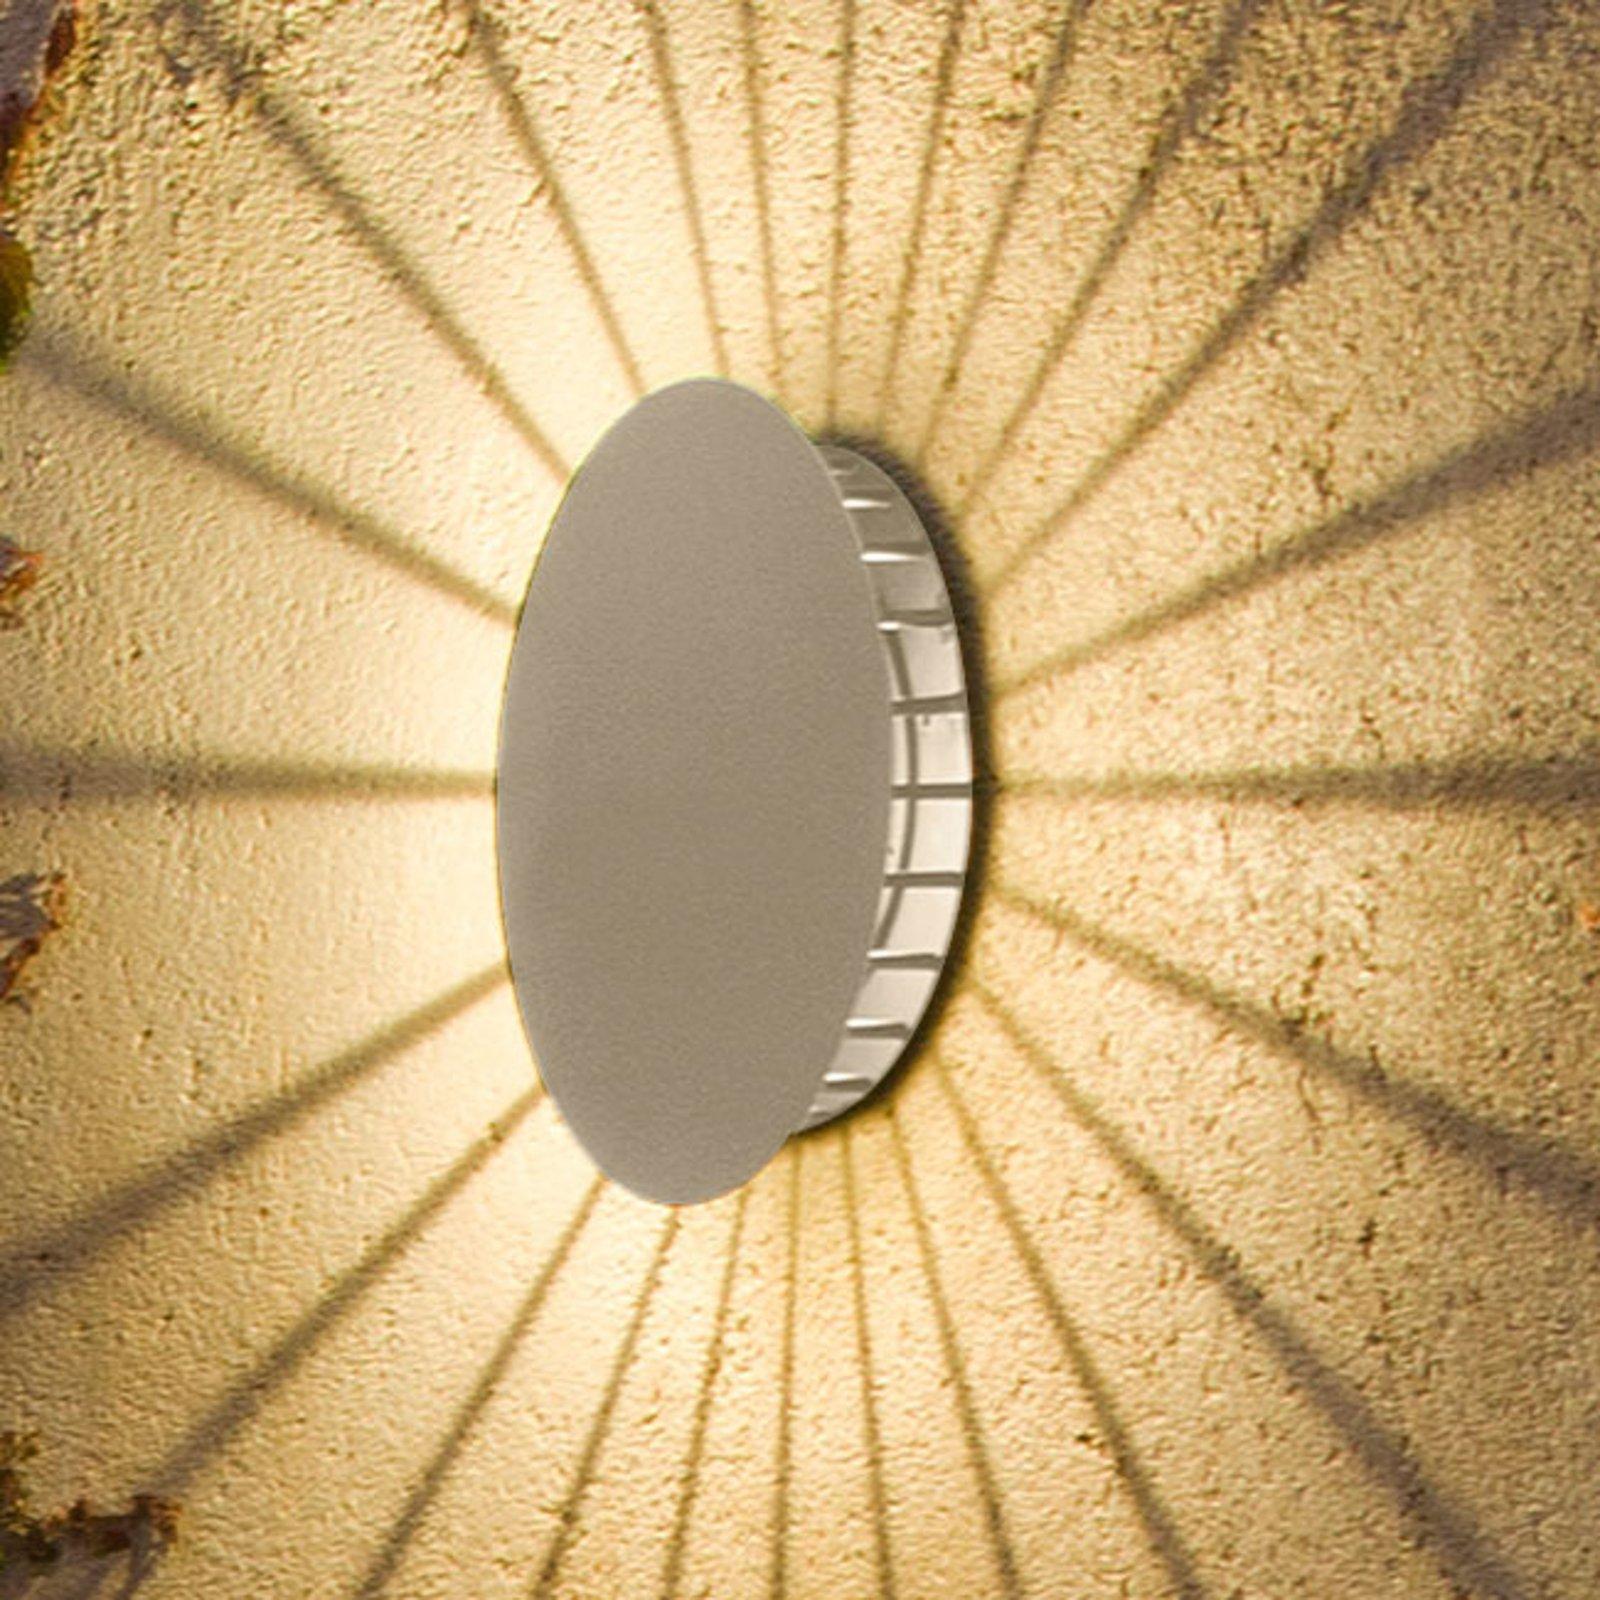 Vibia Meridiano 4720 utendørs vegglampe, kremhvit